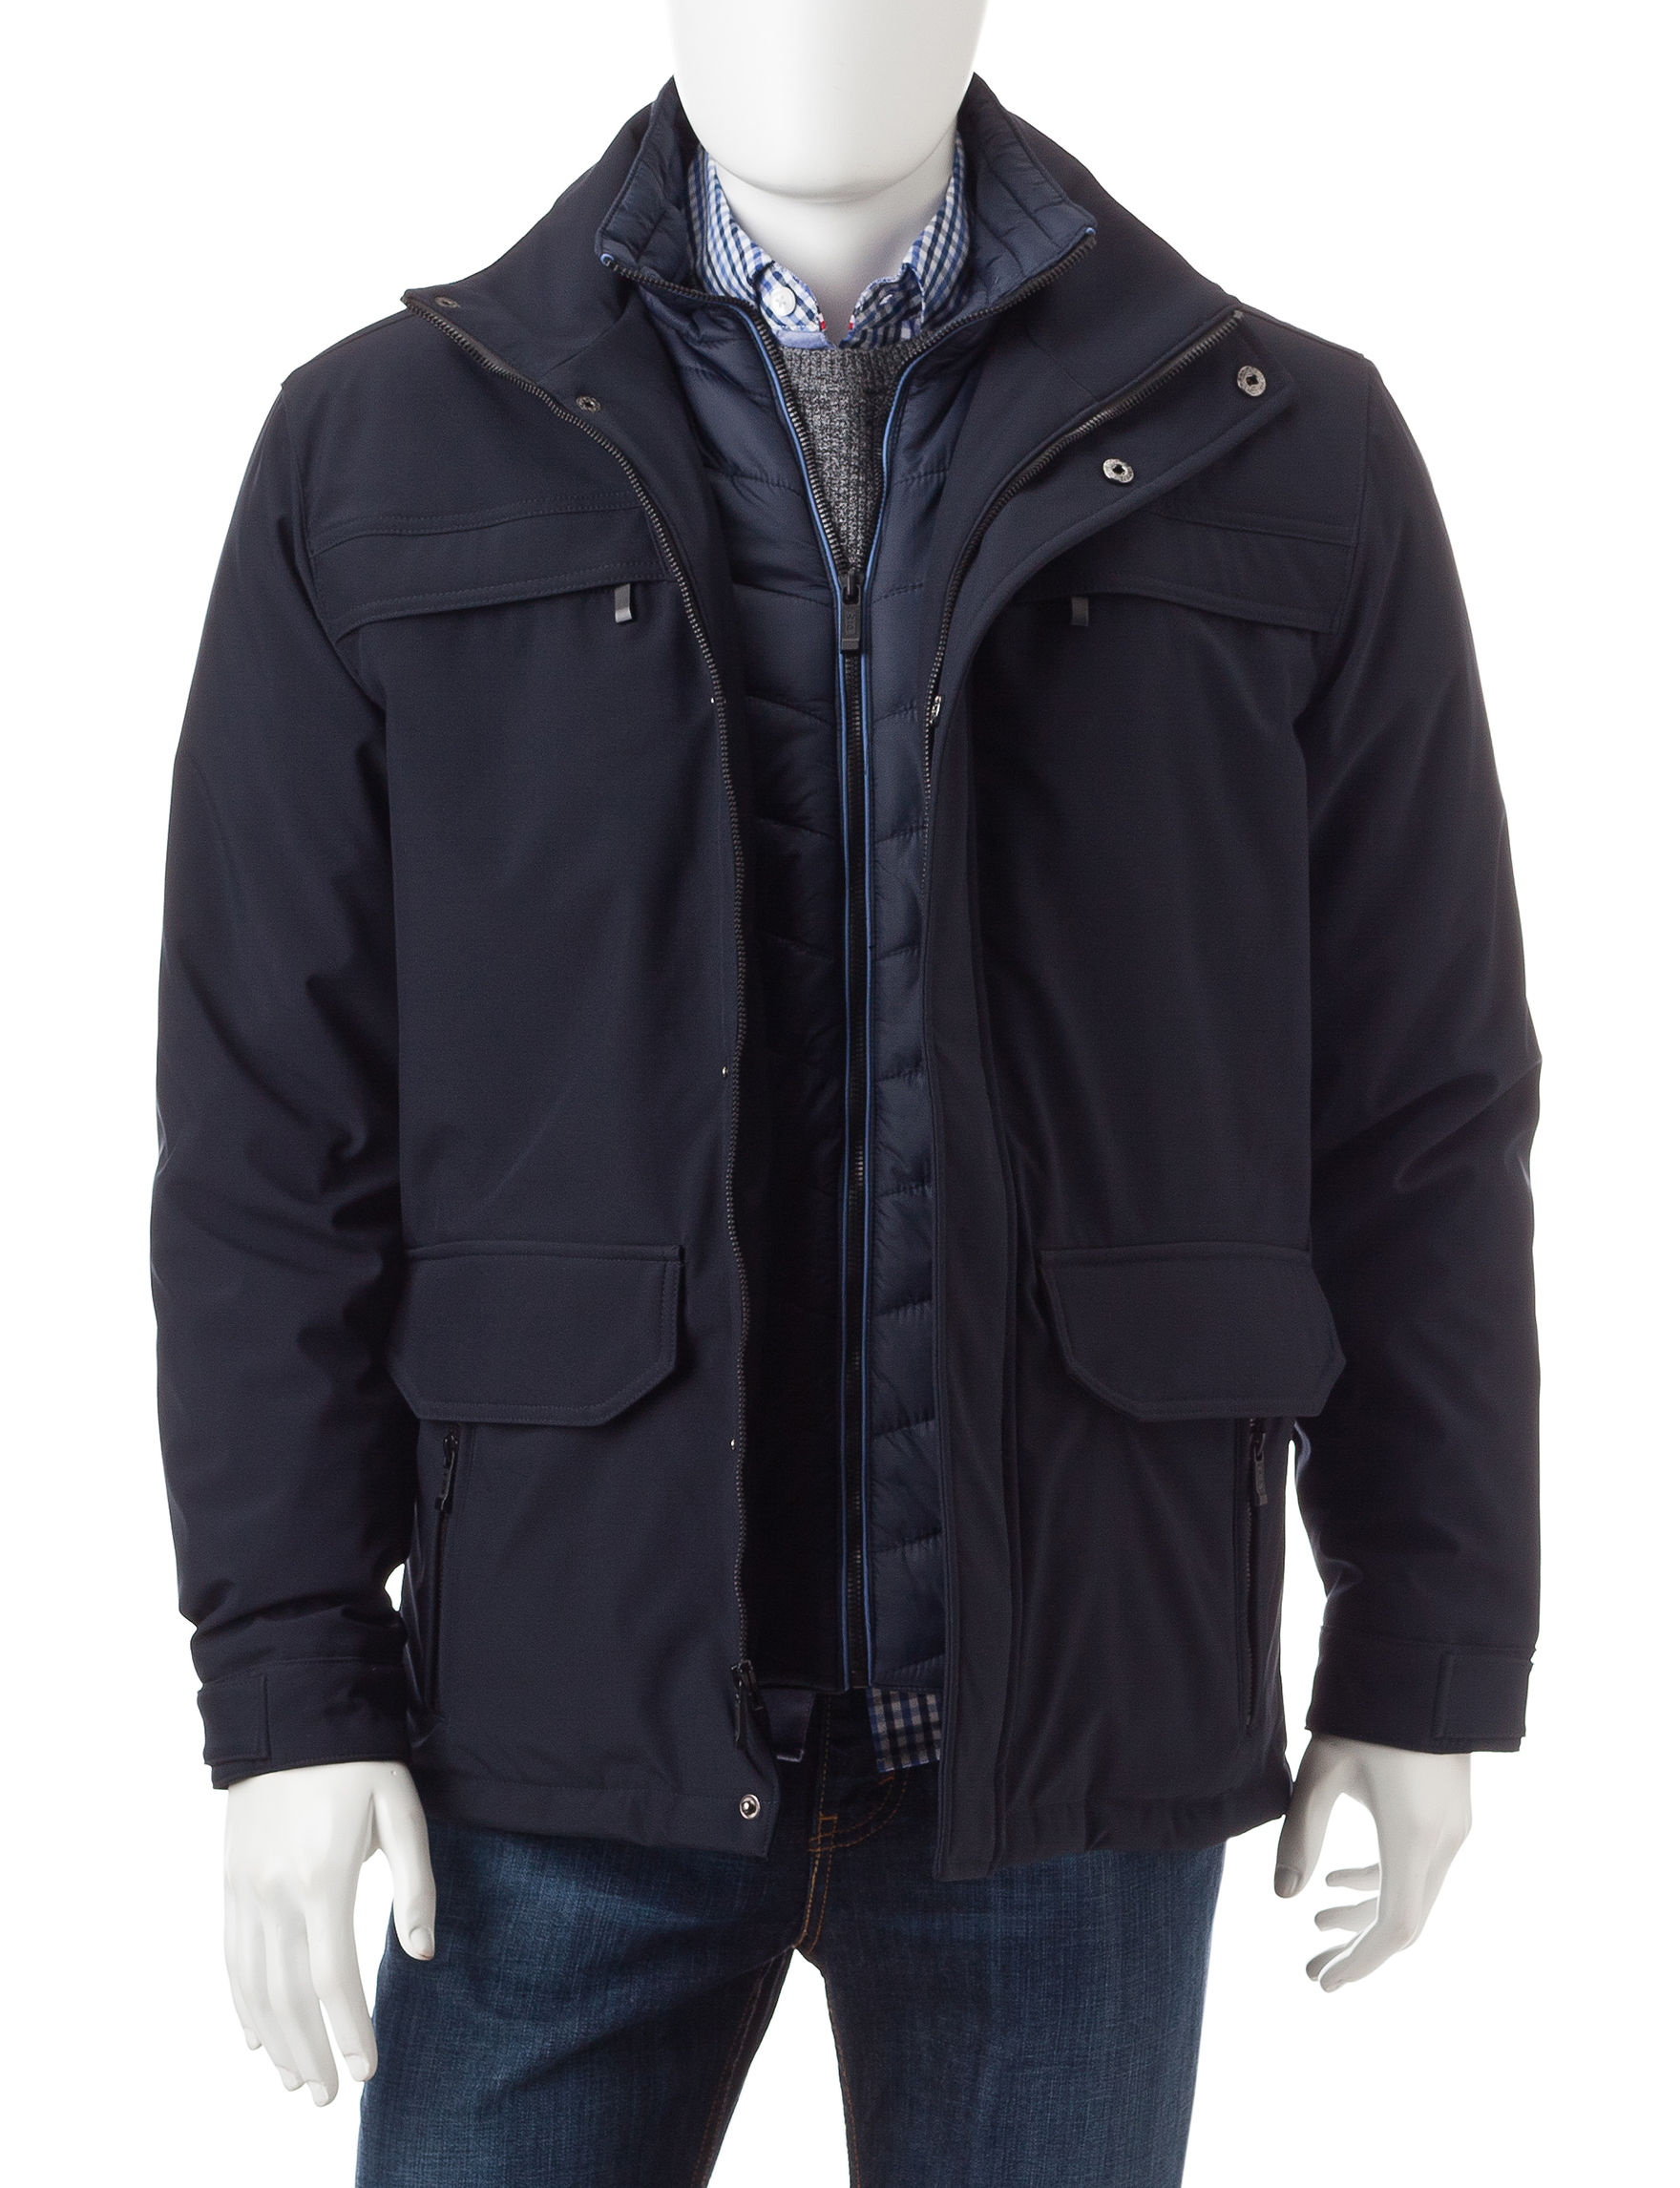 Weatherproof Navy Insulated Jackets